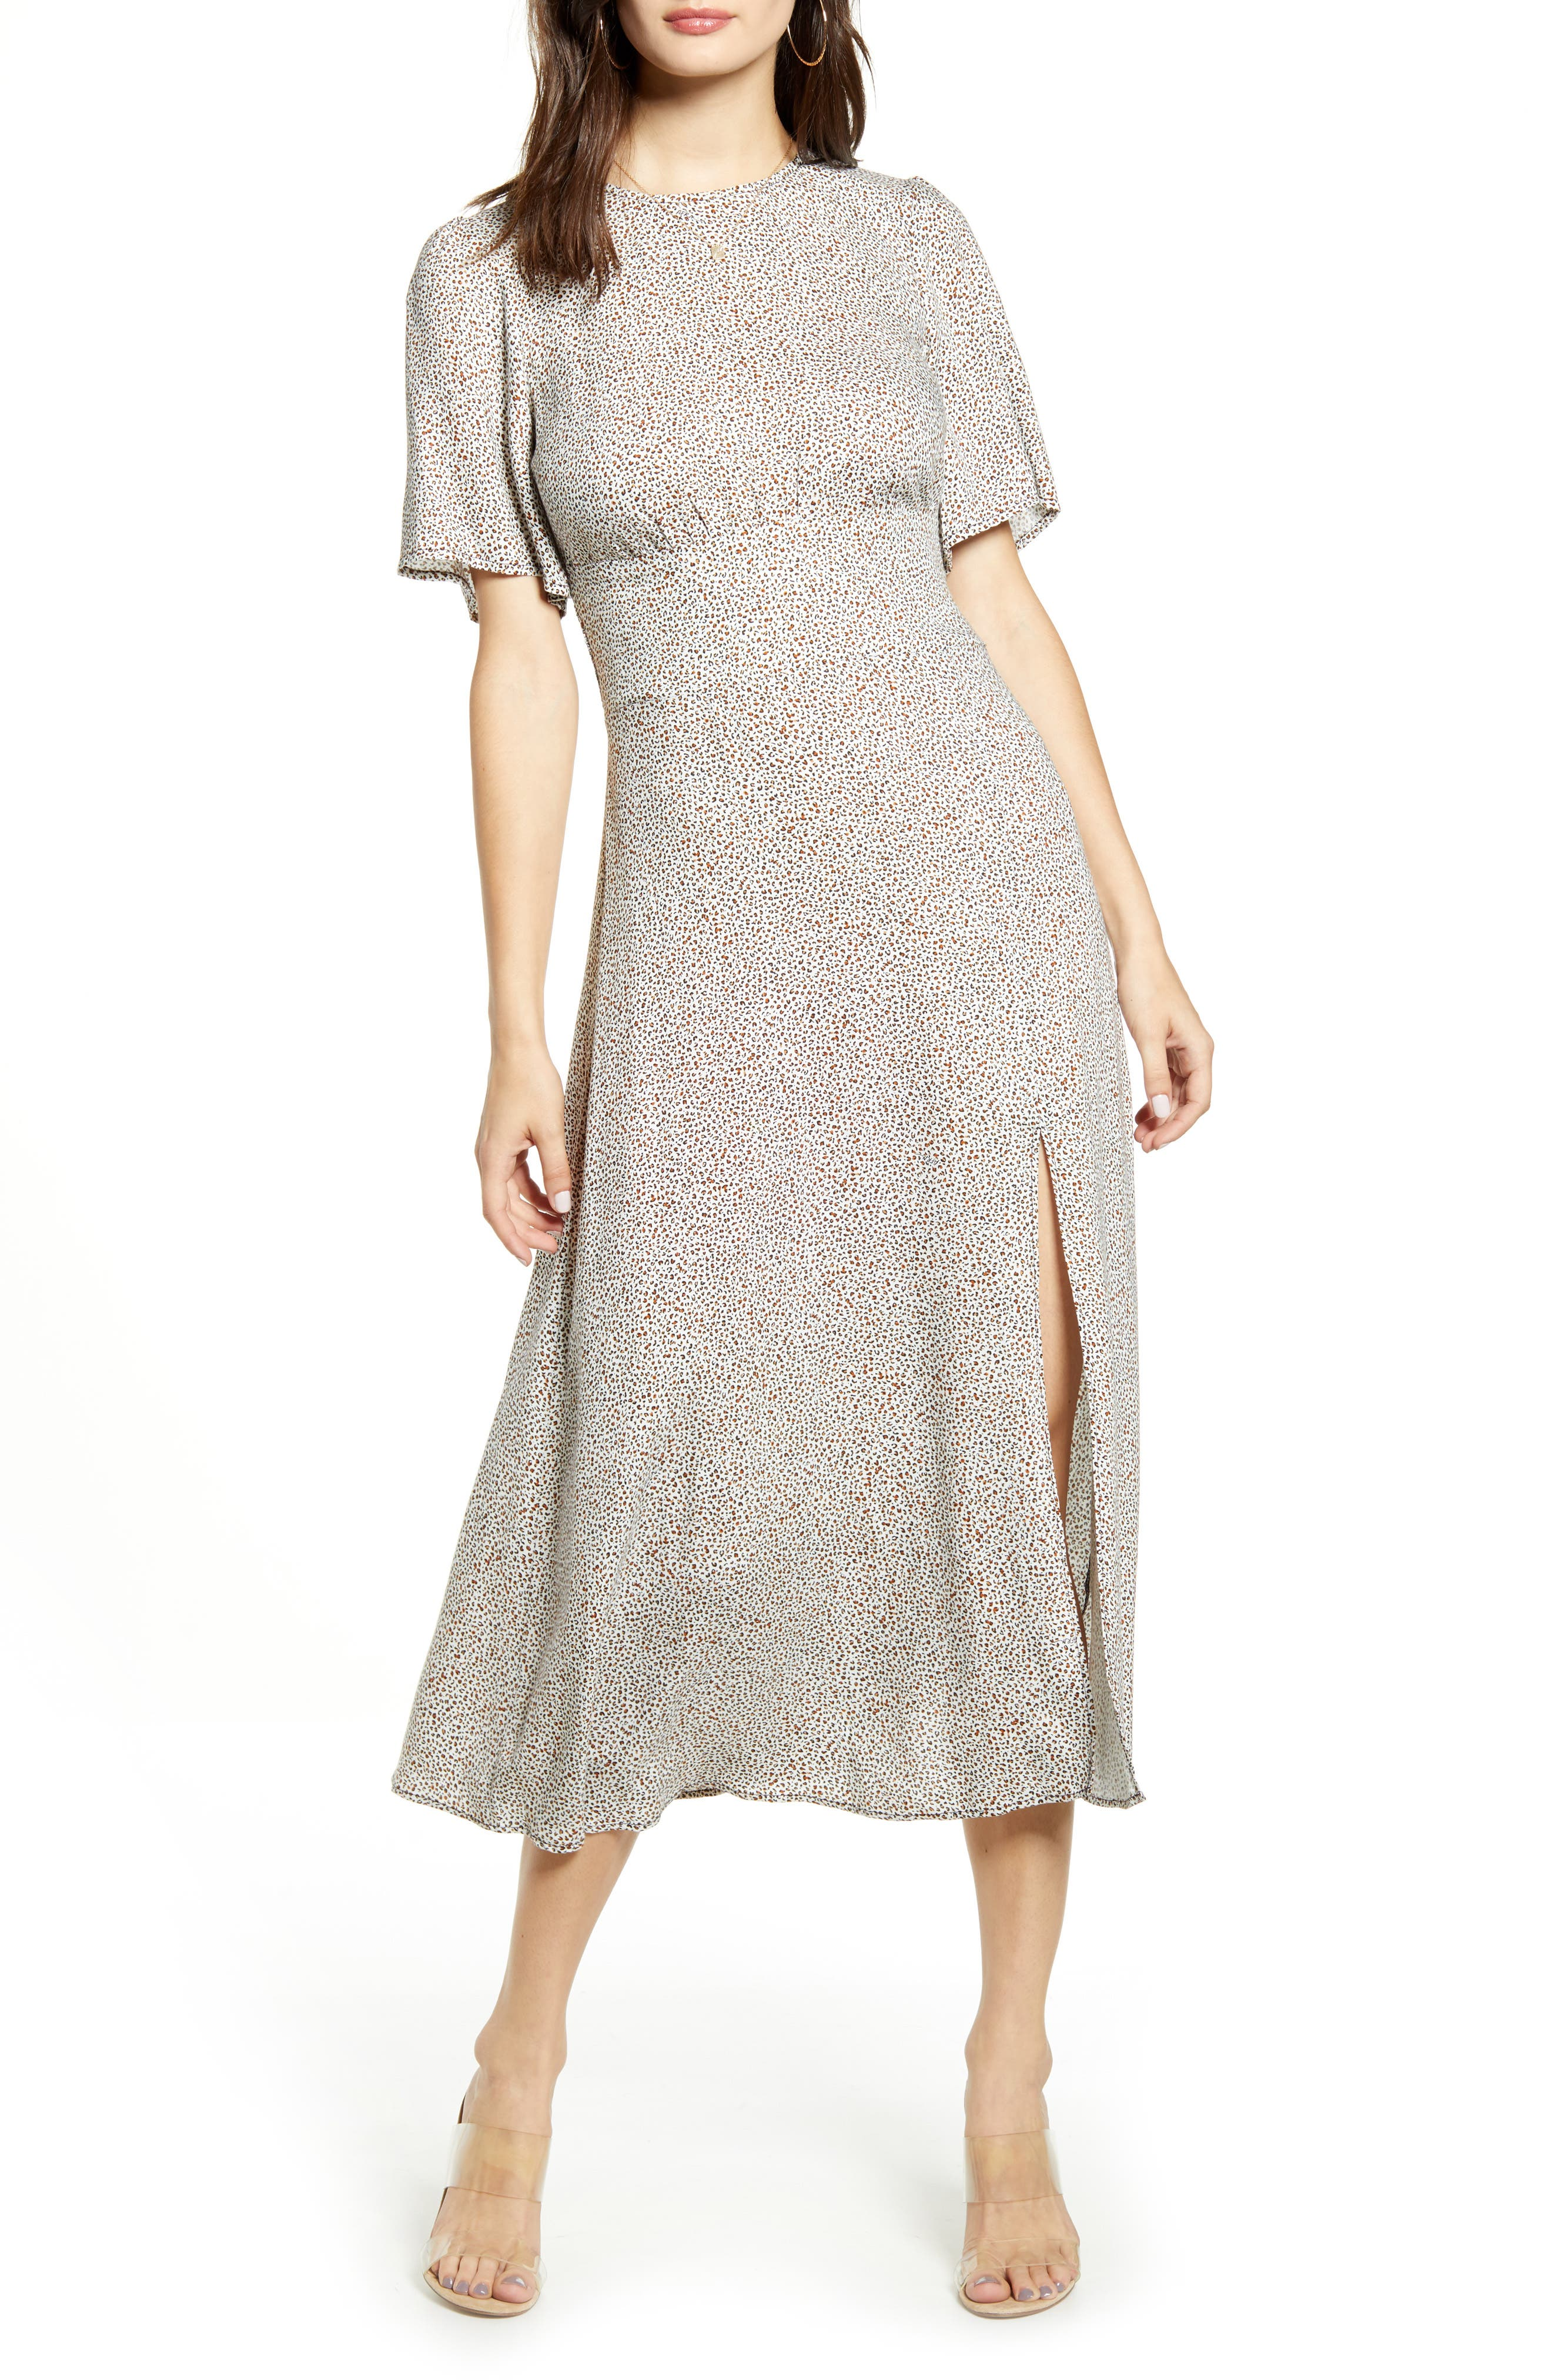 Afrm Janice Midi Dress, Beige